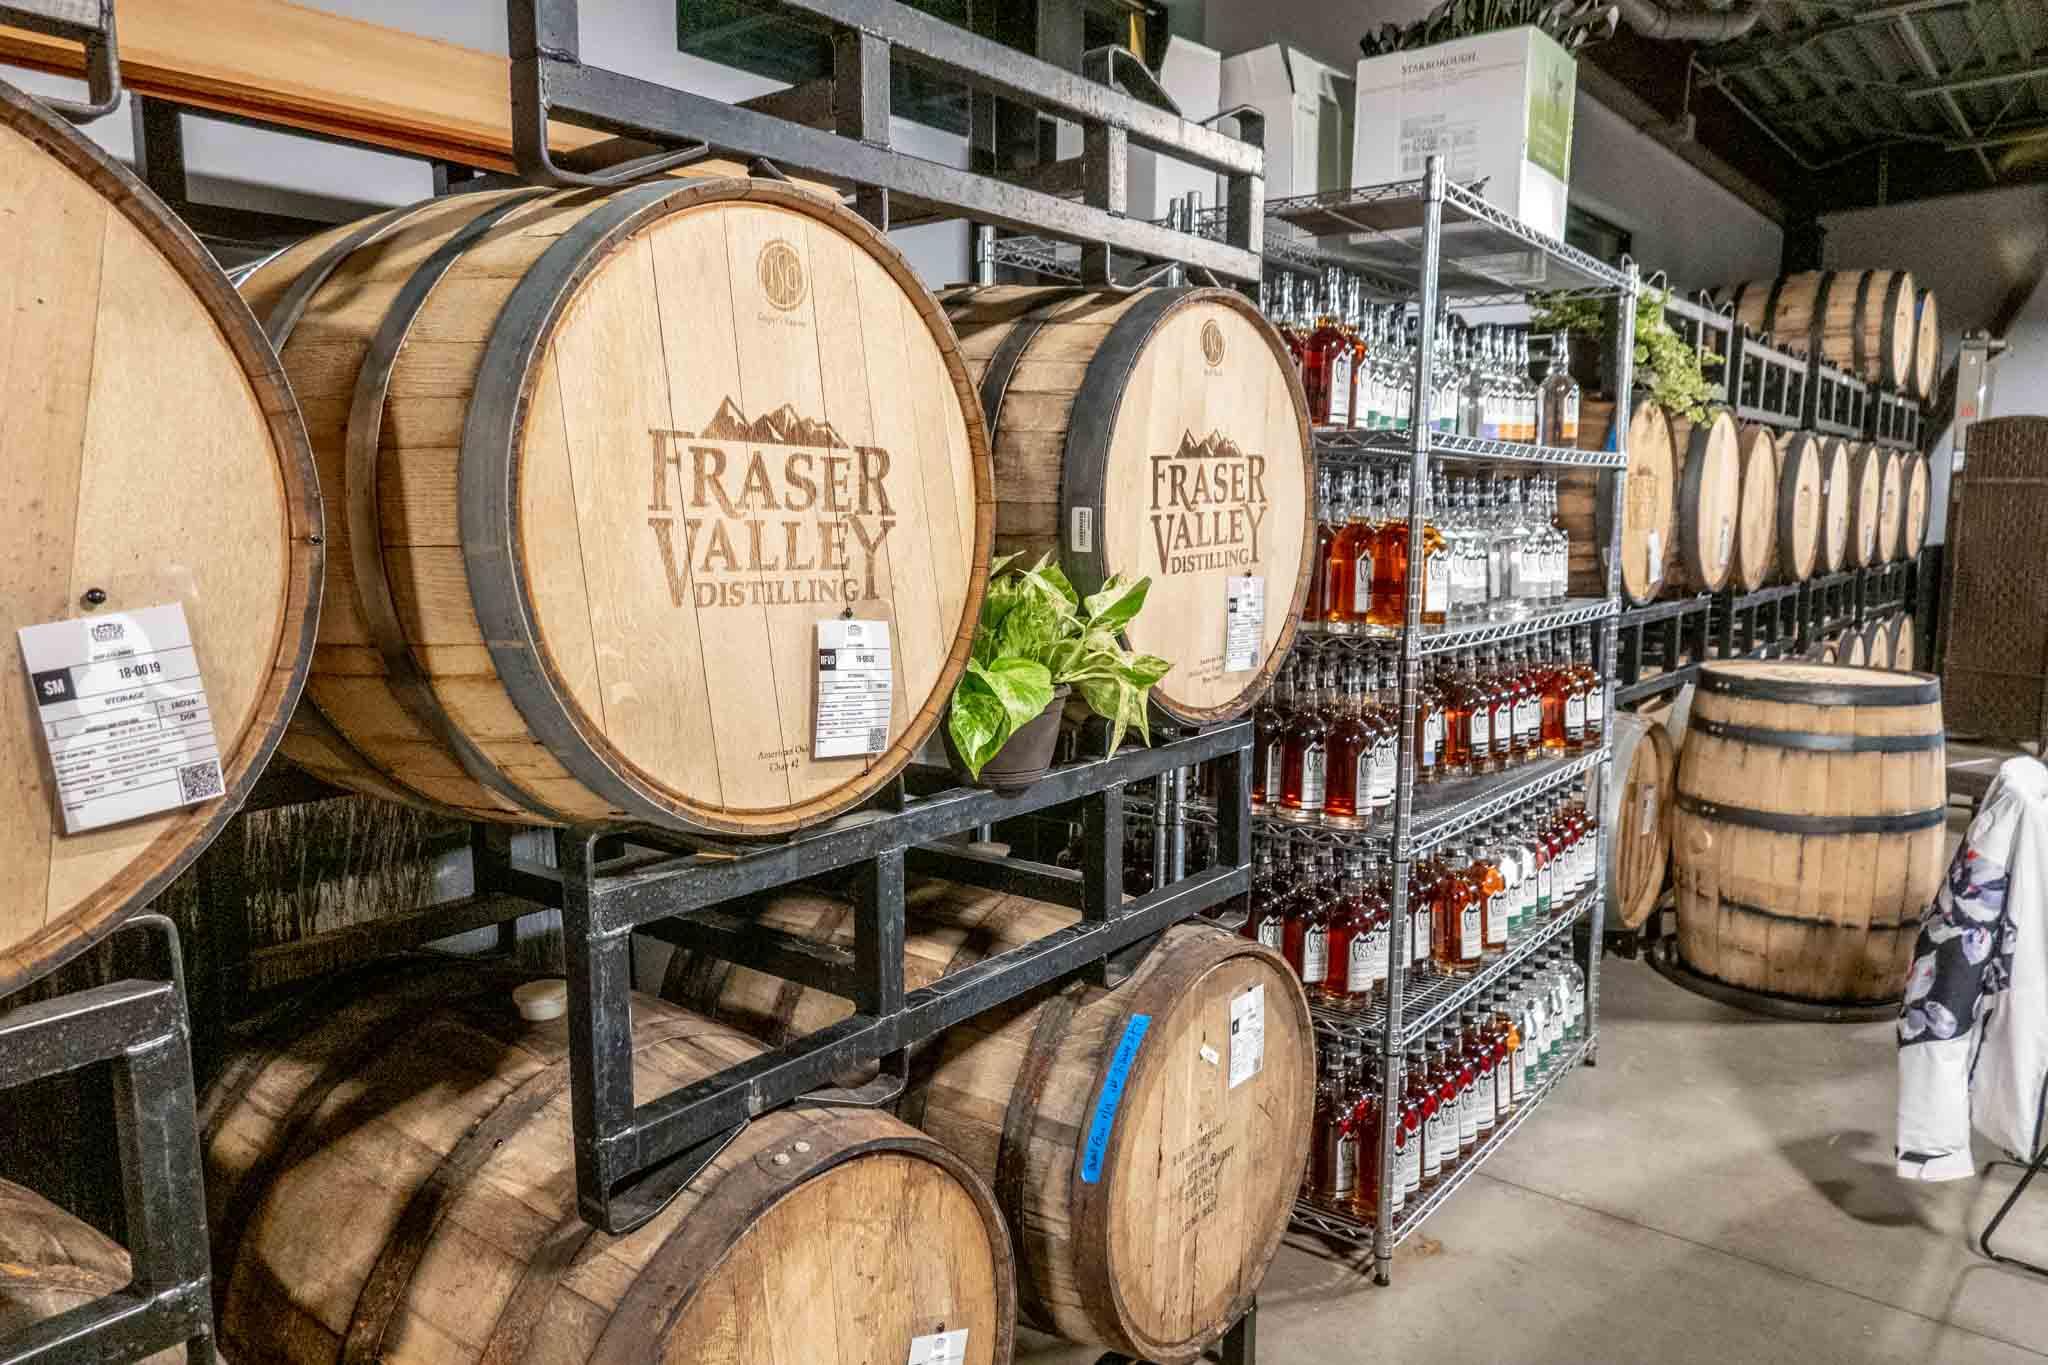 Stacked barrels at Fraser Valley Distilling